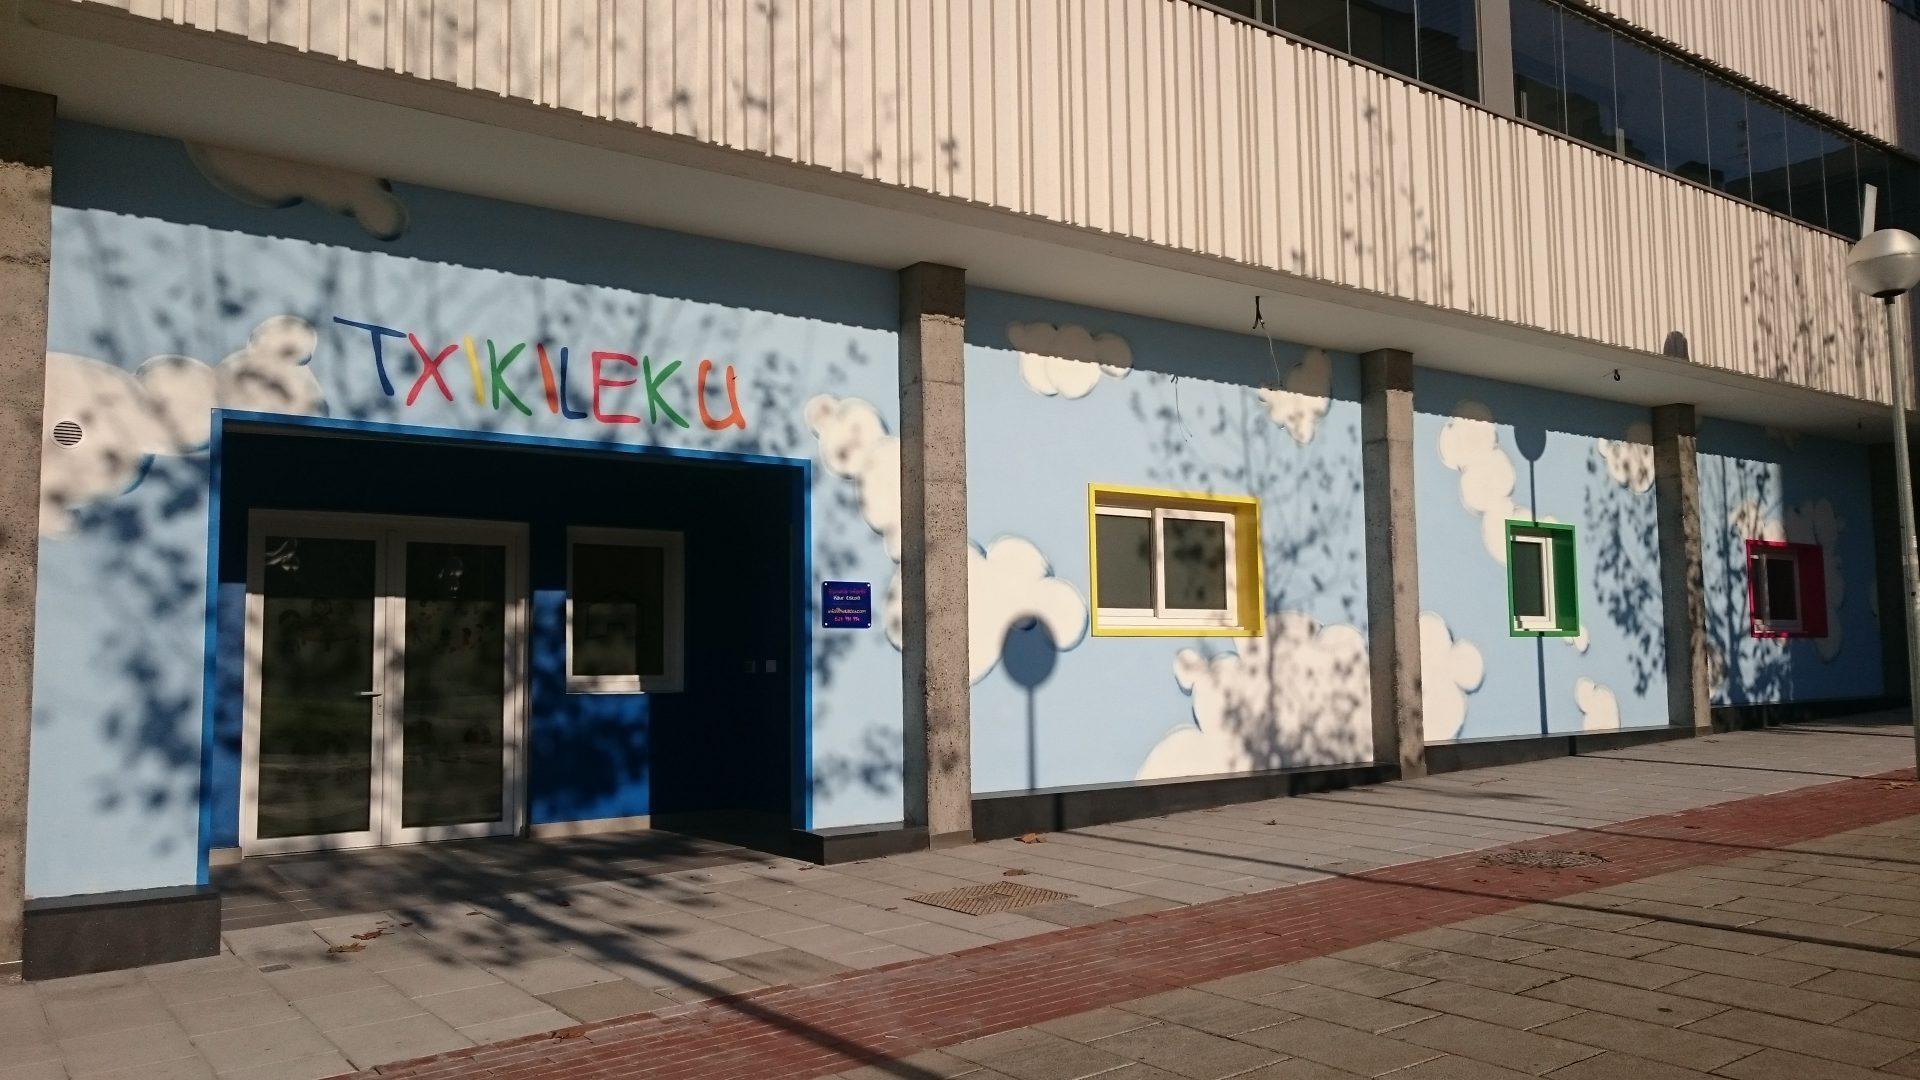 Txikileku fachada